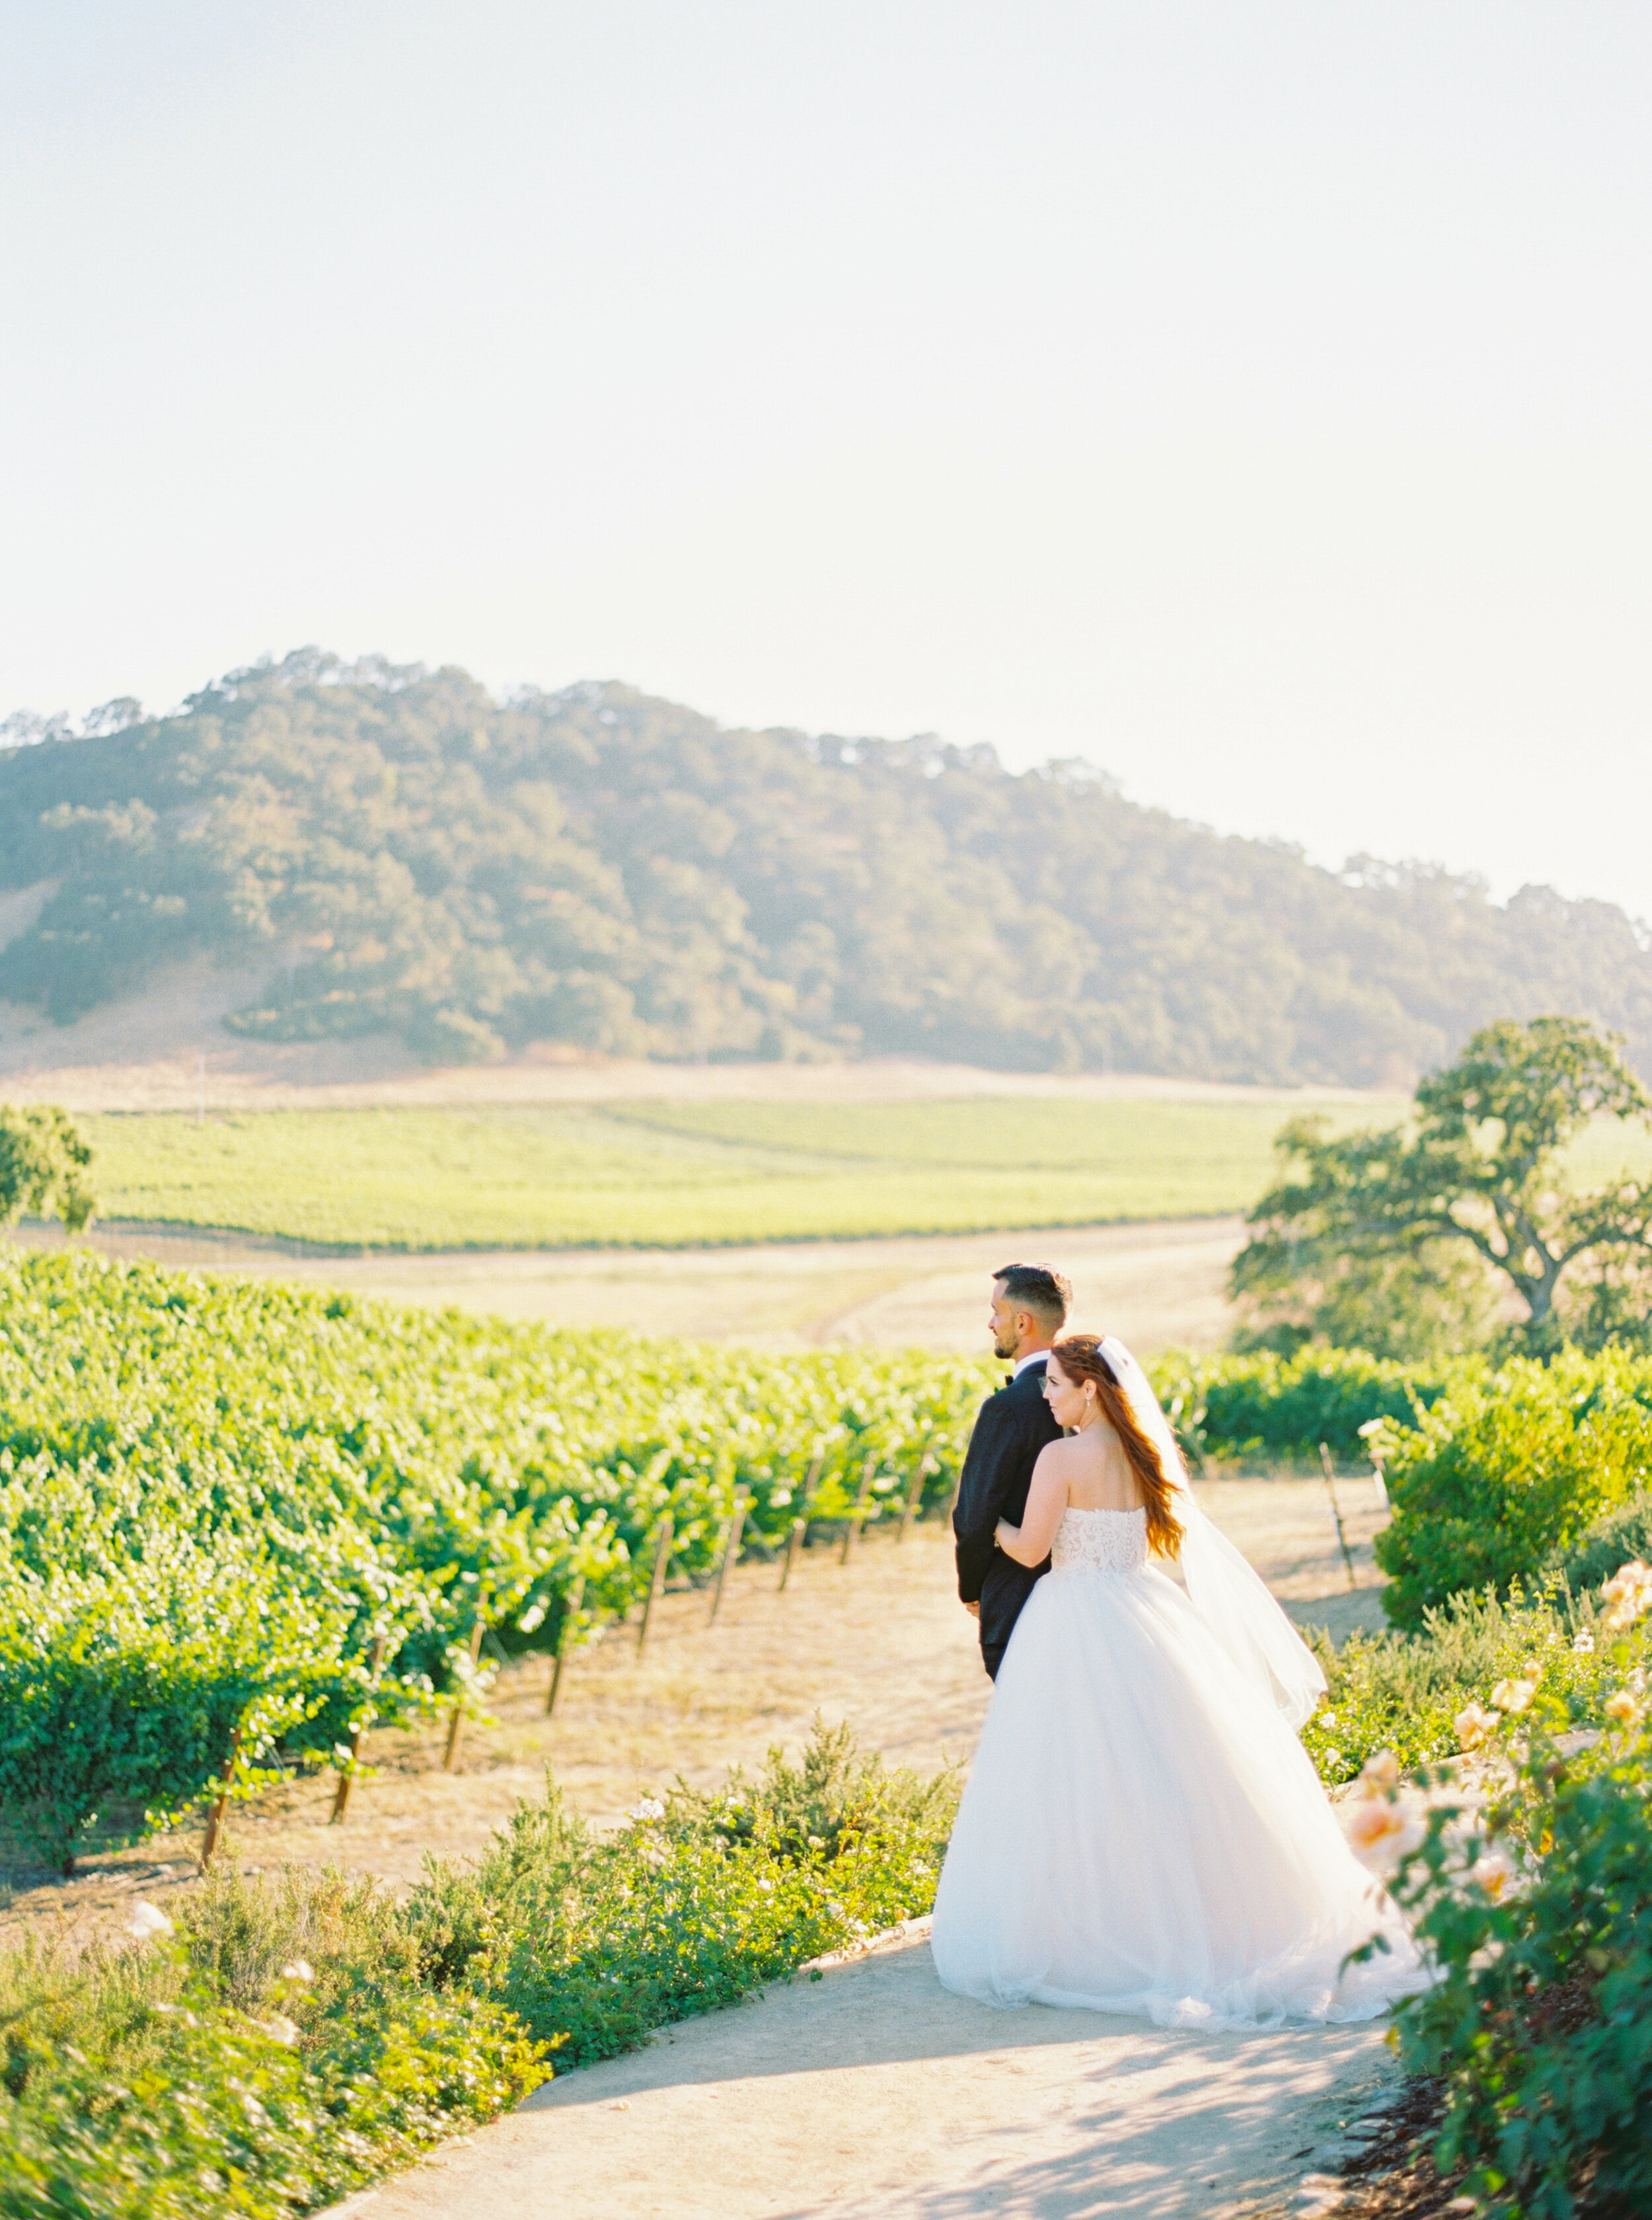 Clos LaChance Winery Classic Romantic Wedding-7.jpg